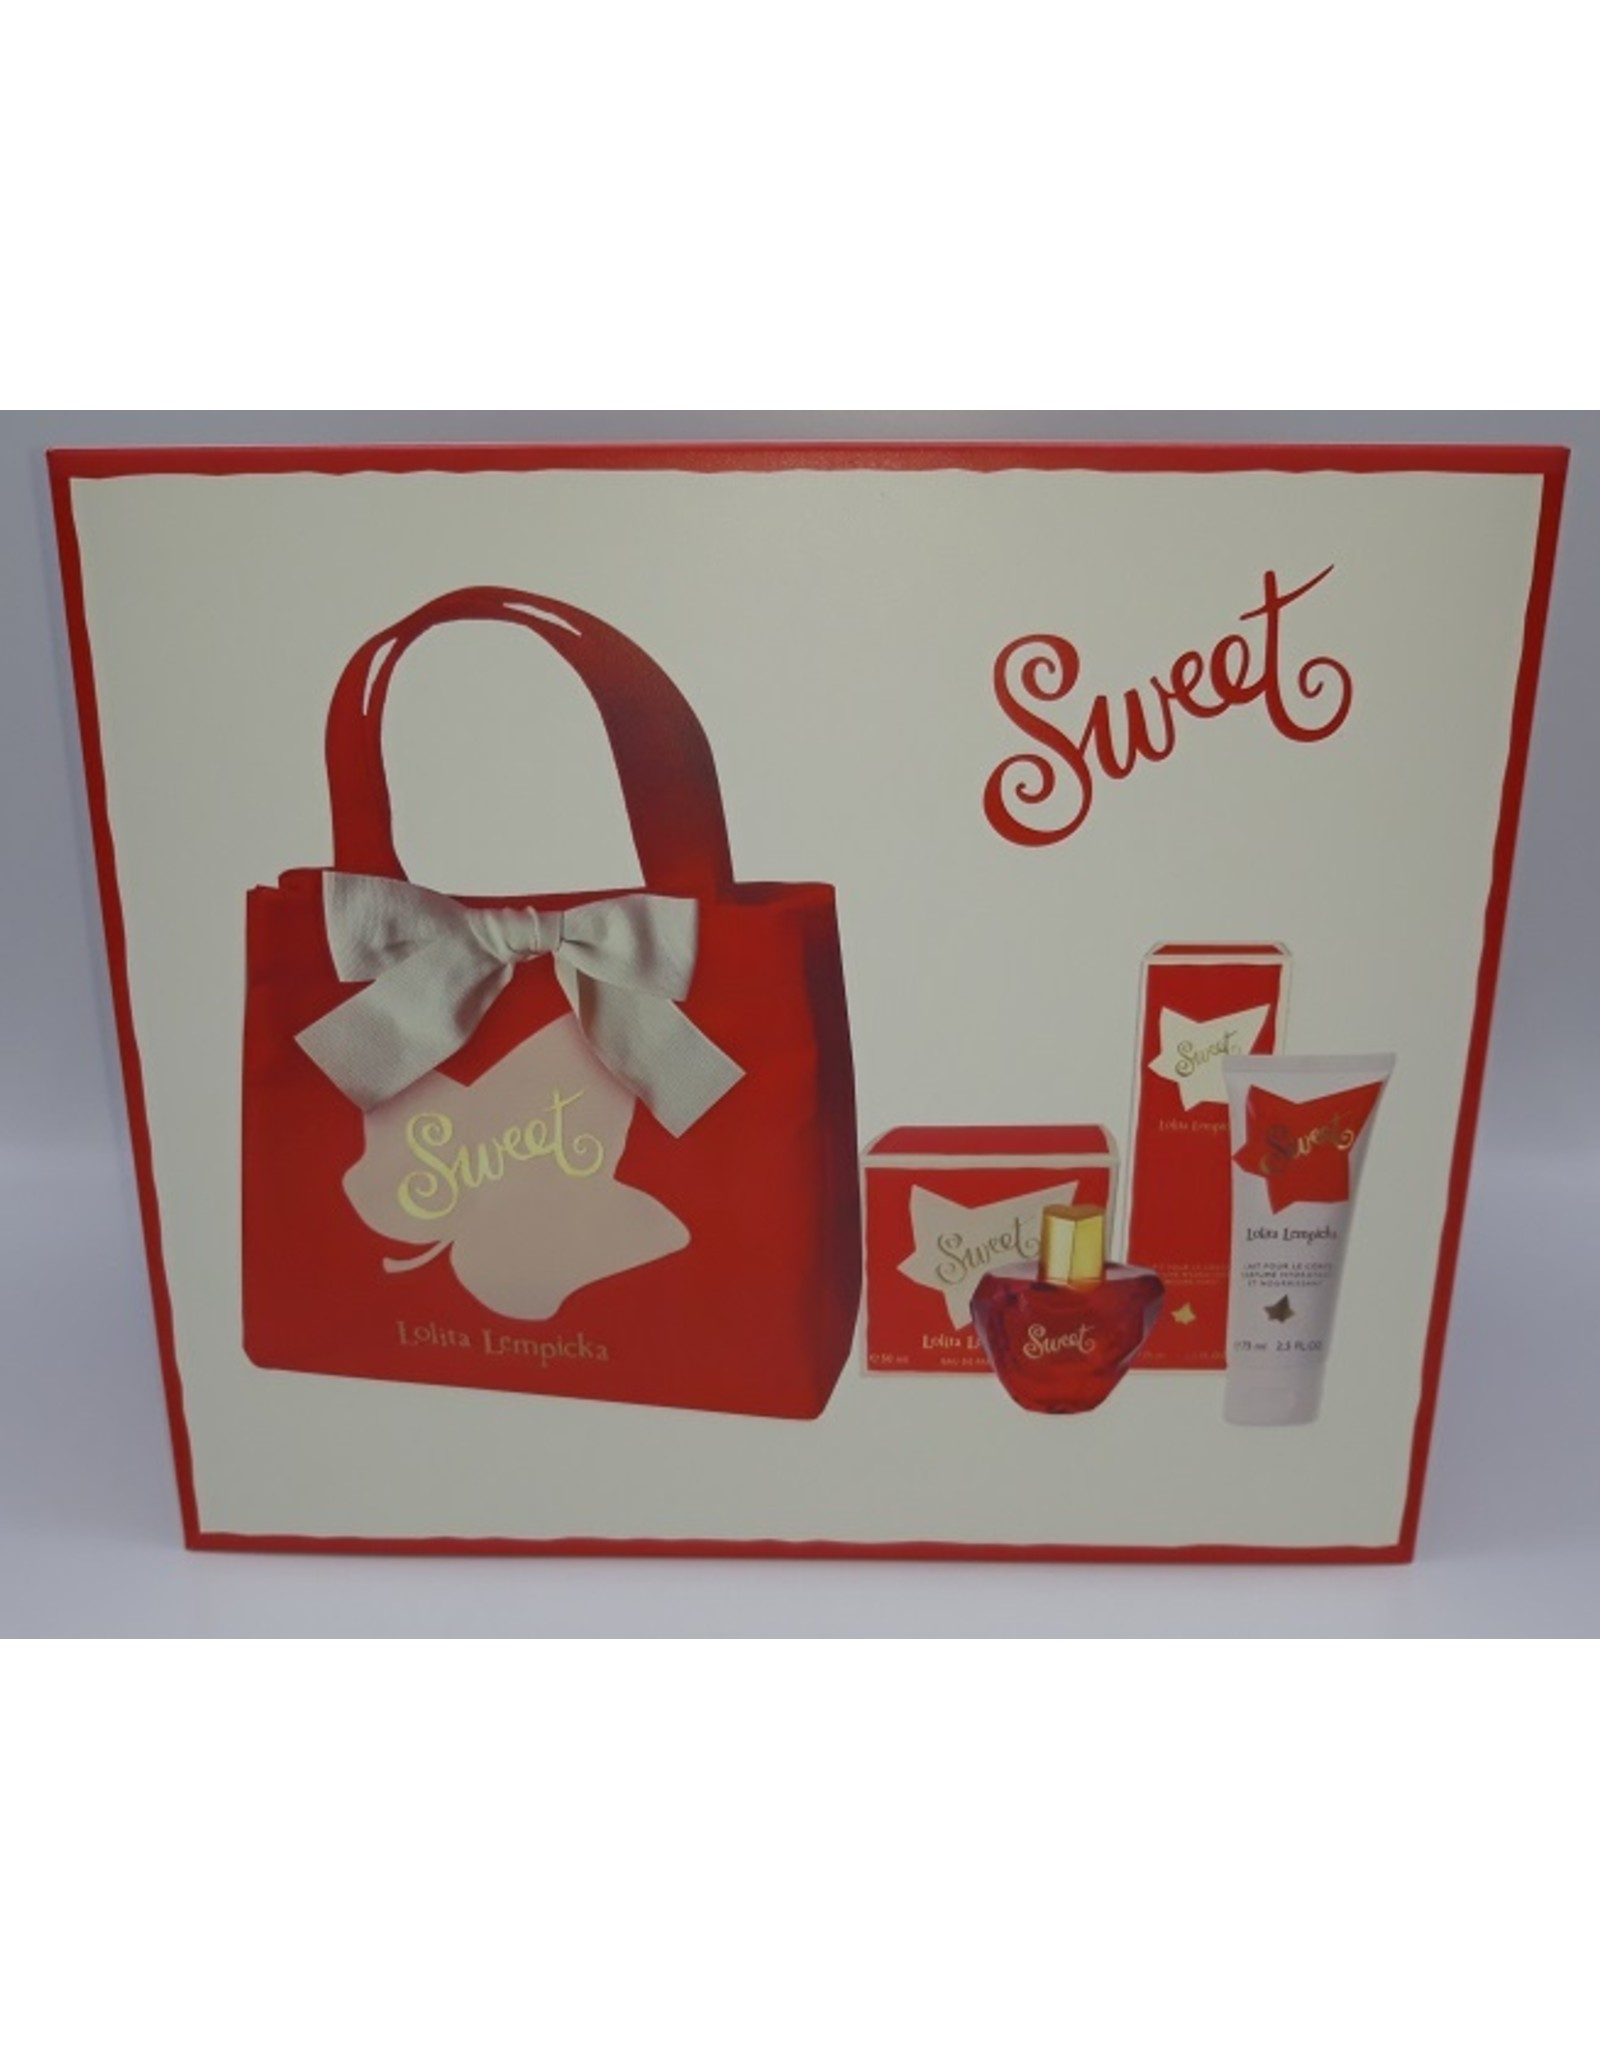 Lolita Lempicka Gift Box Sweet - Lolita Lempicka